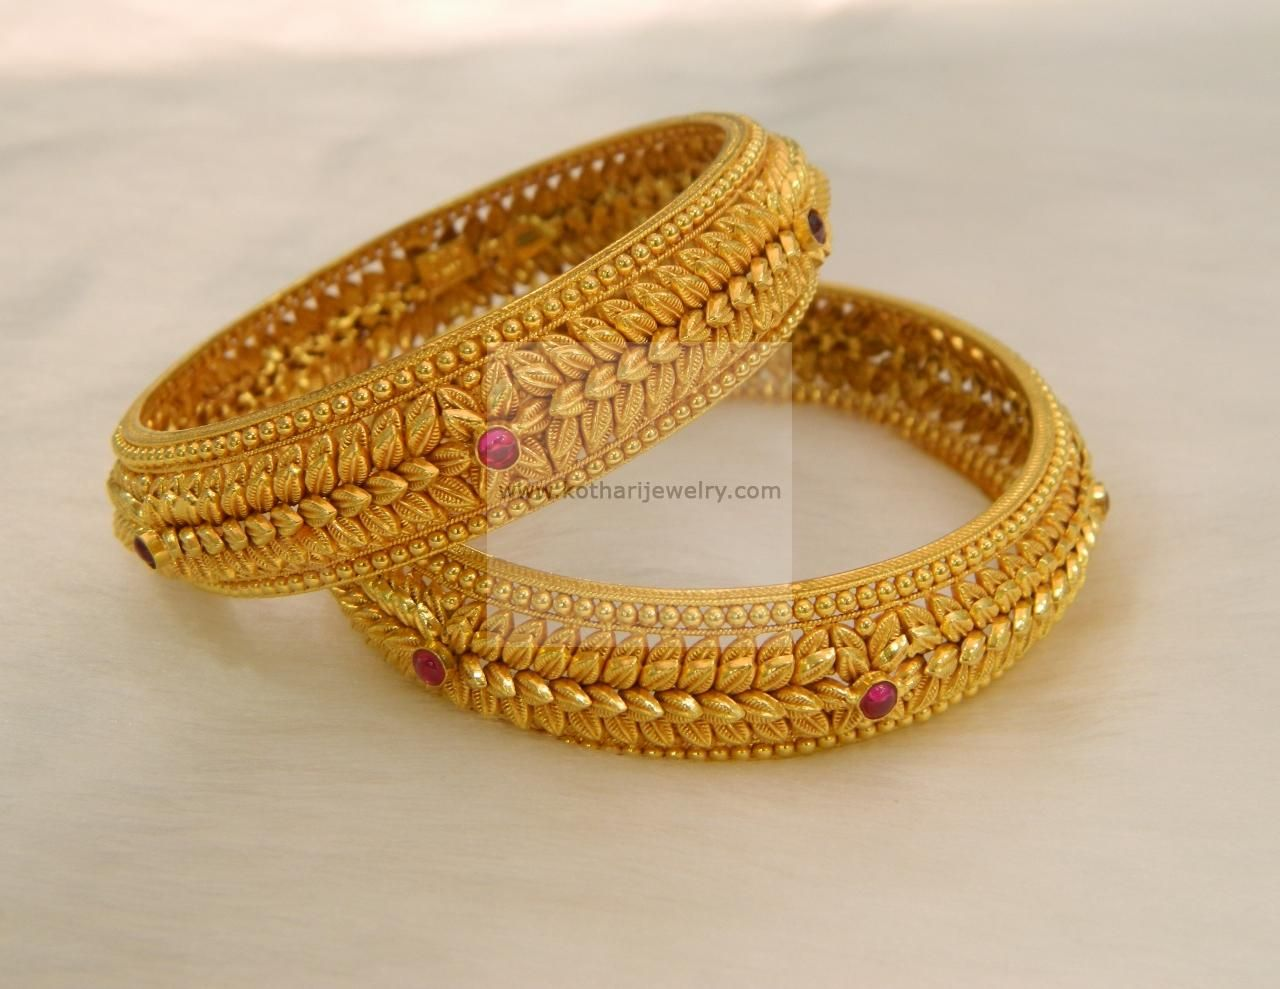 bangles bracelets kada gold jewellery bangles. Black Bedroom Furniture Sets. Home Design Ideas